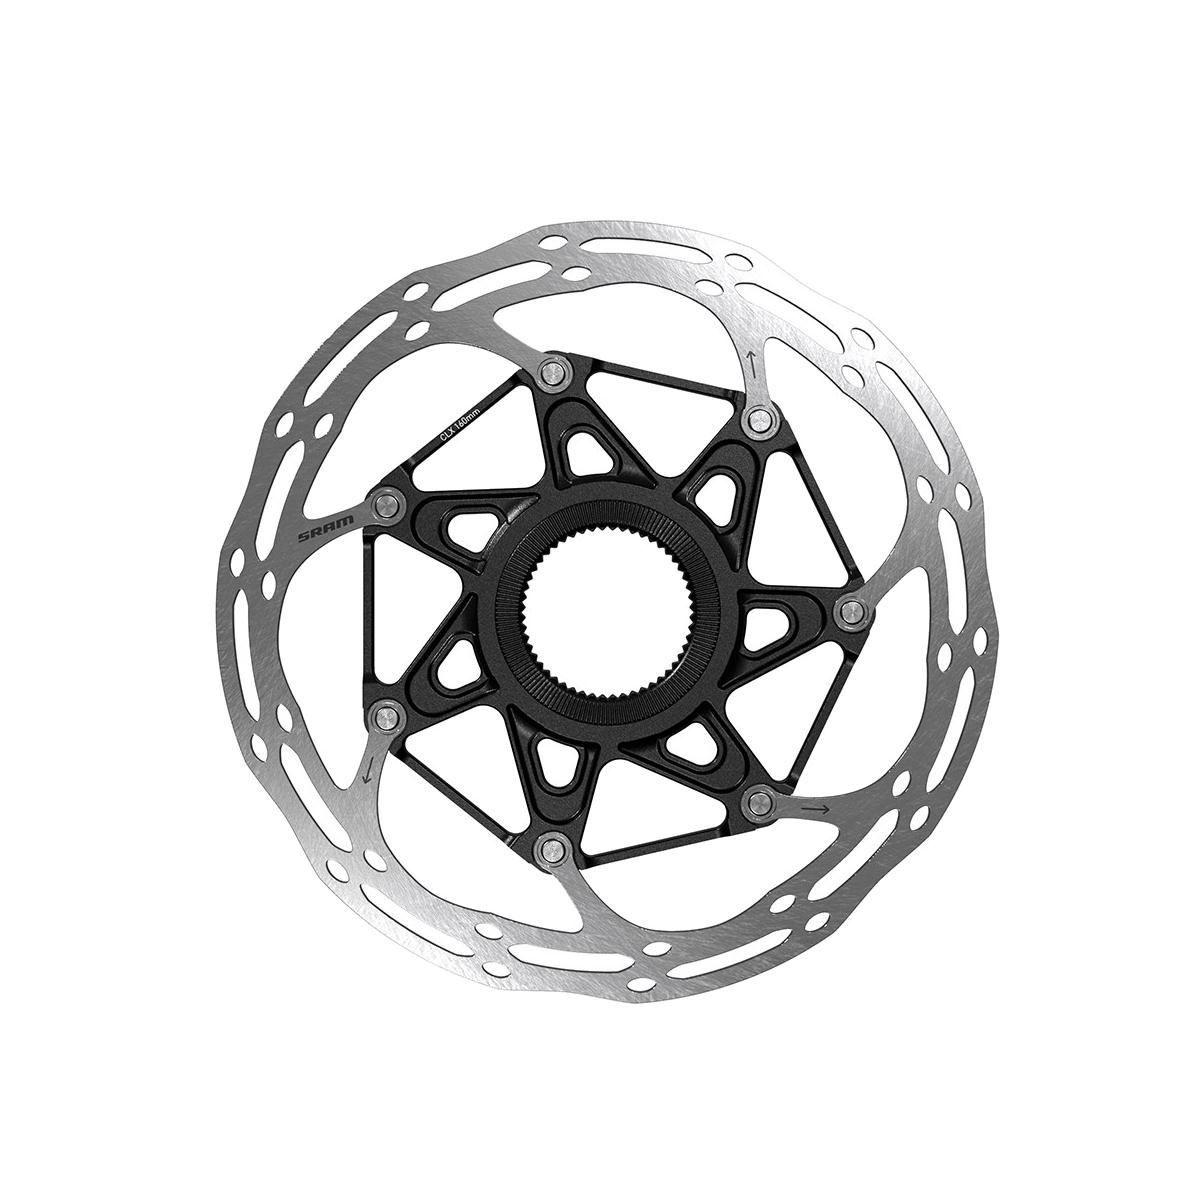 Sram Rotor Centerline 2 Piece Centerlock Black Rounded: Black 180Mm